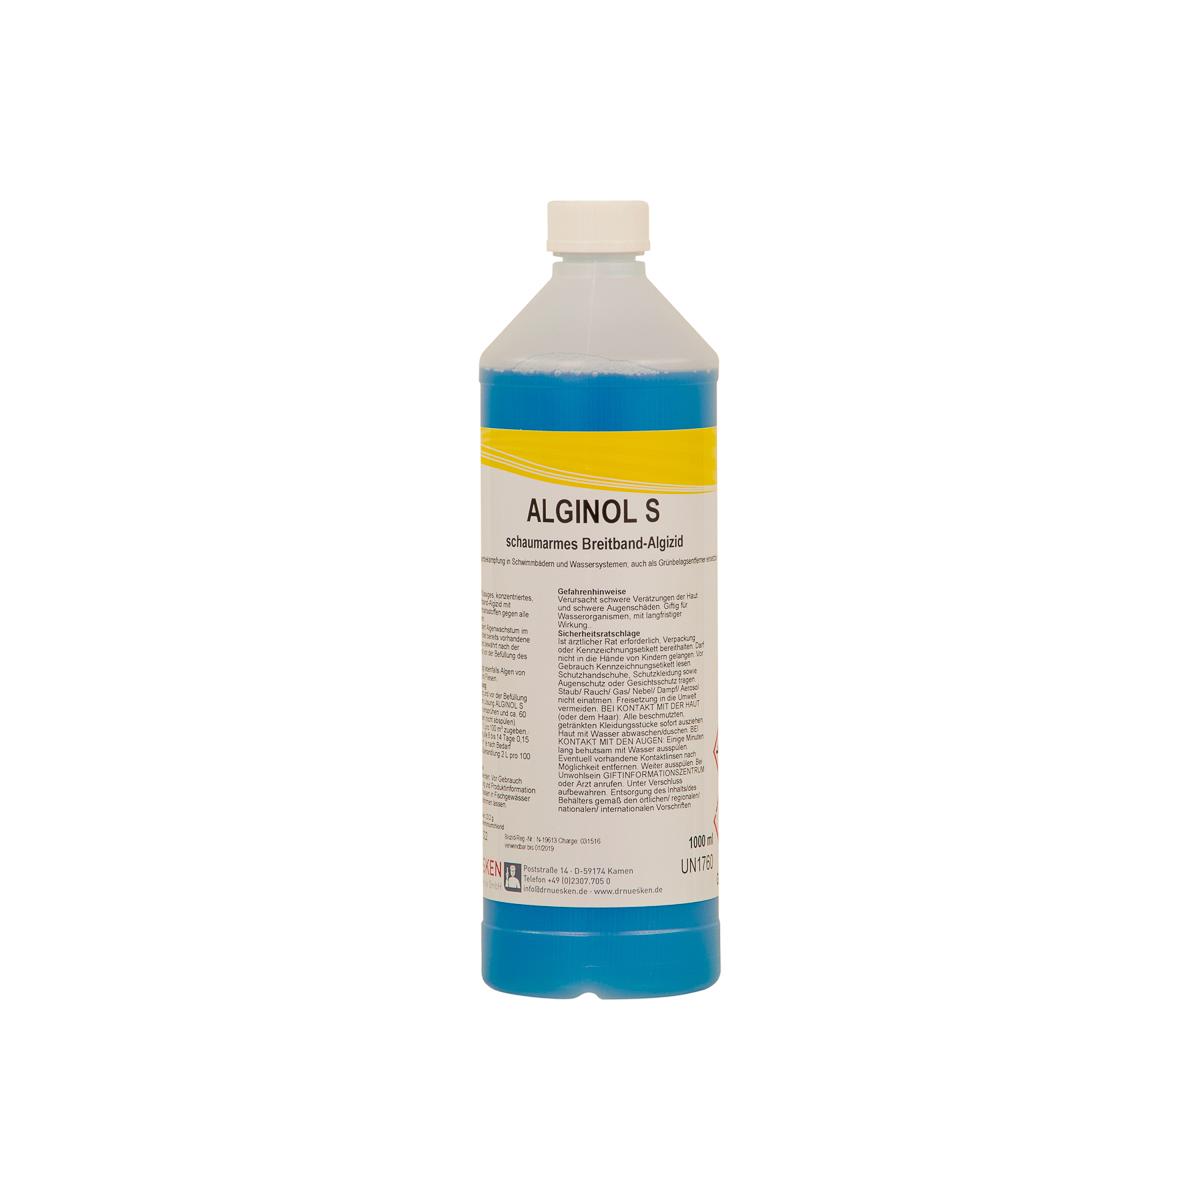 Alginol S 1 Liter